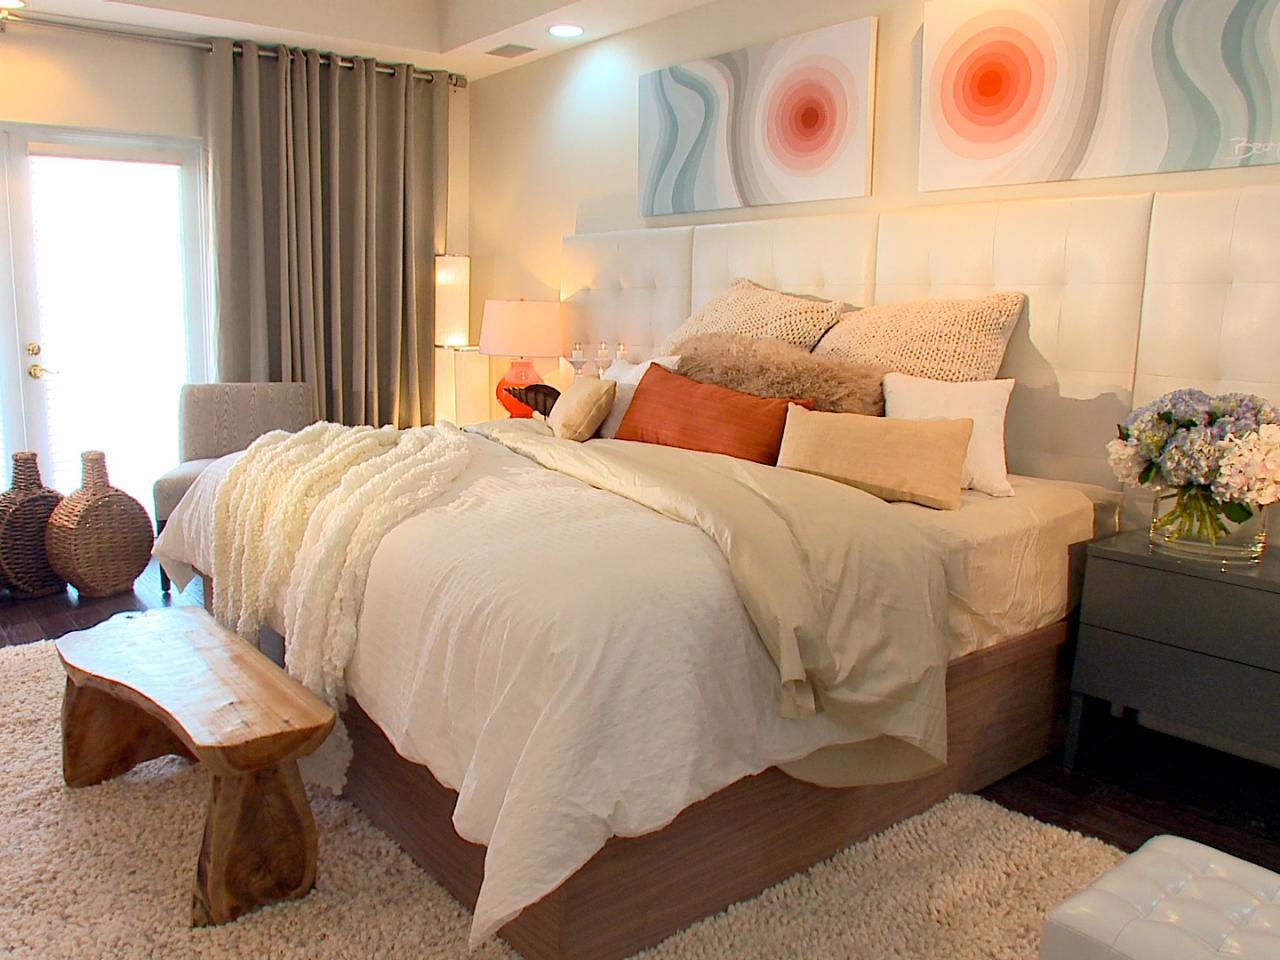 Candice Olson Bedrooms Candice Olson 9781118276815